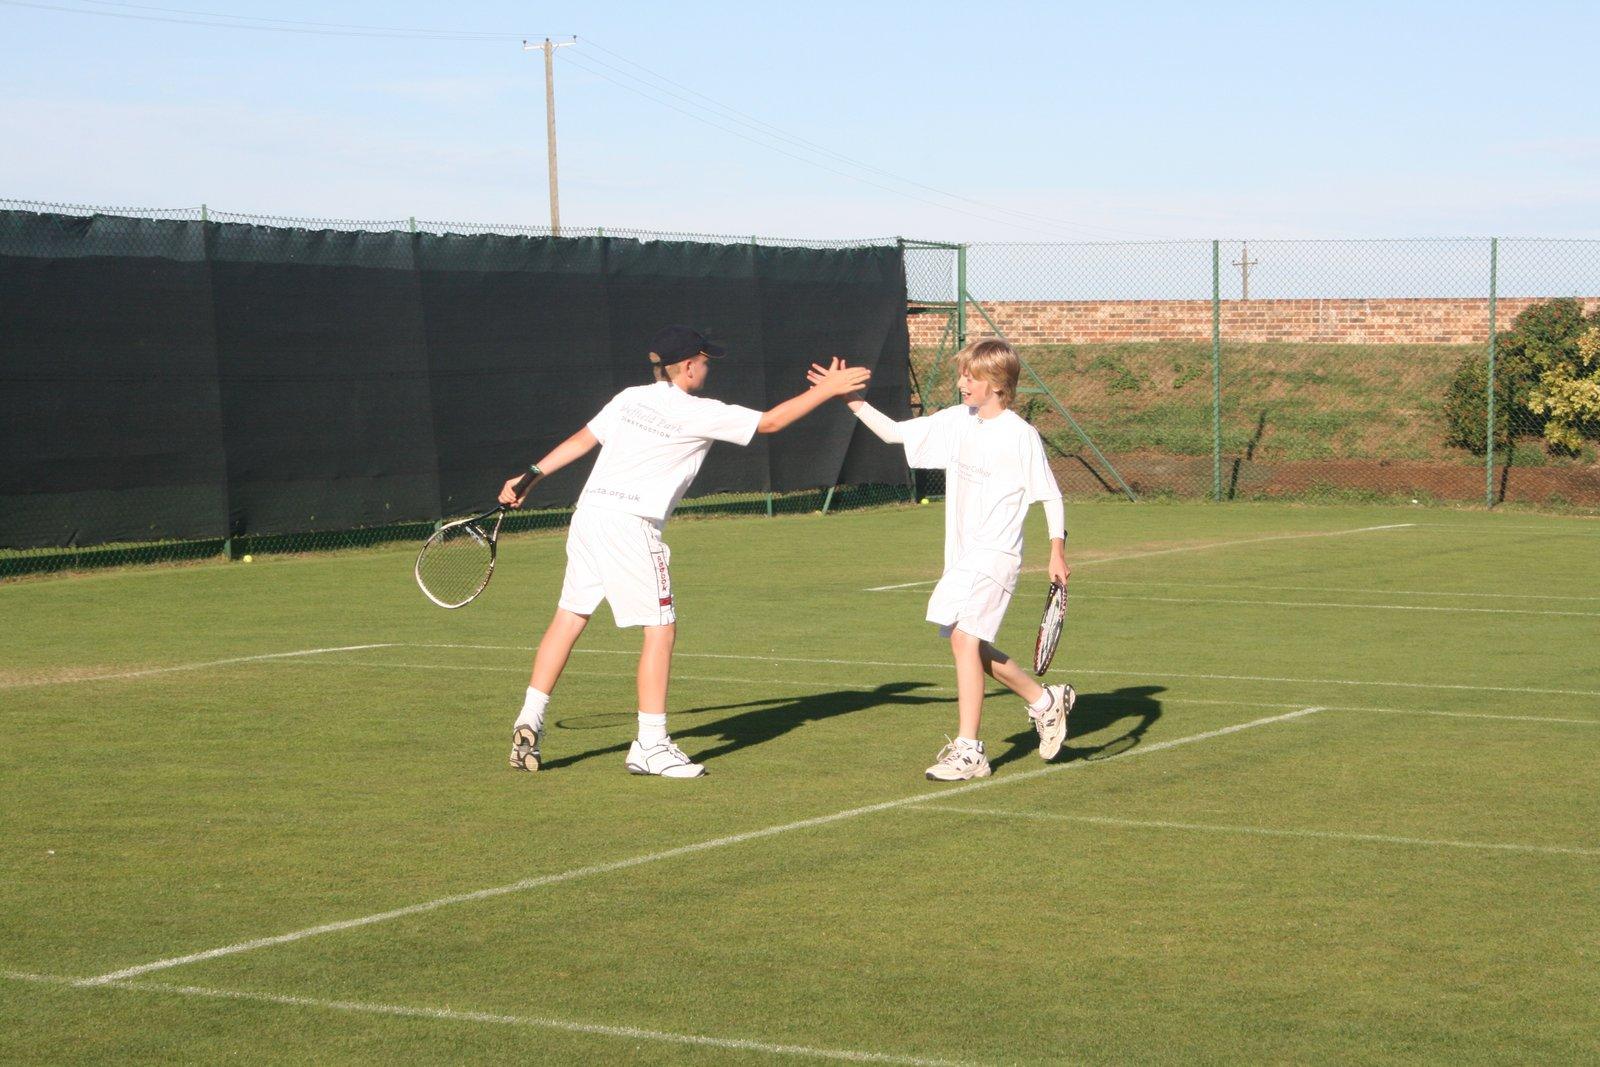 https://www.ryetennisandsquashclub.org.uk/wp-content/uploads/2019/05/Tennis-303.jpg